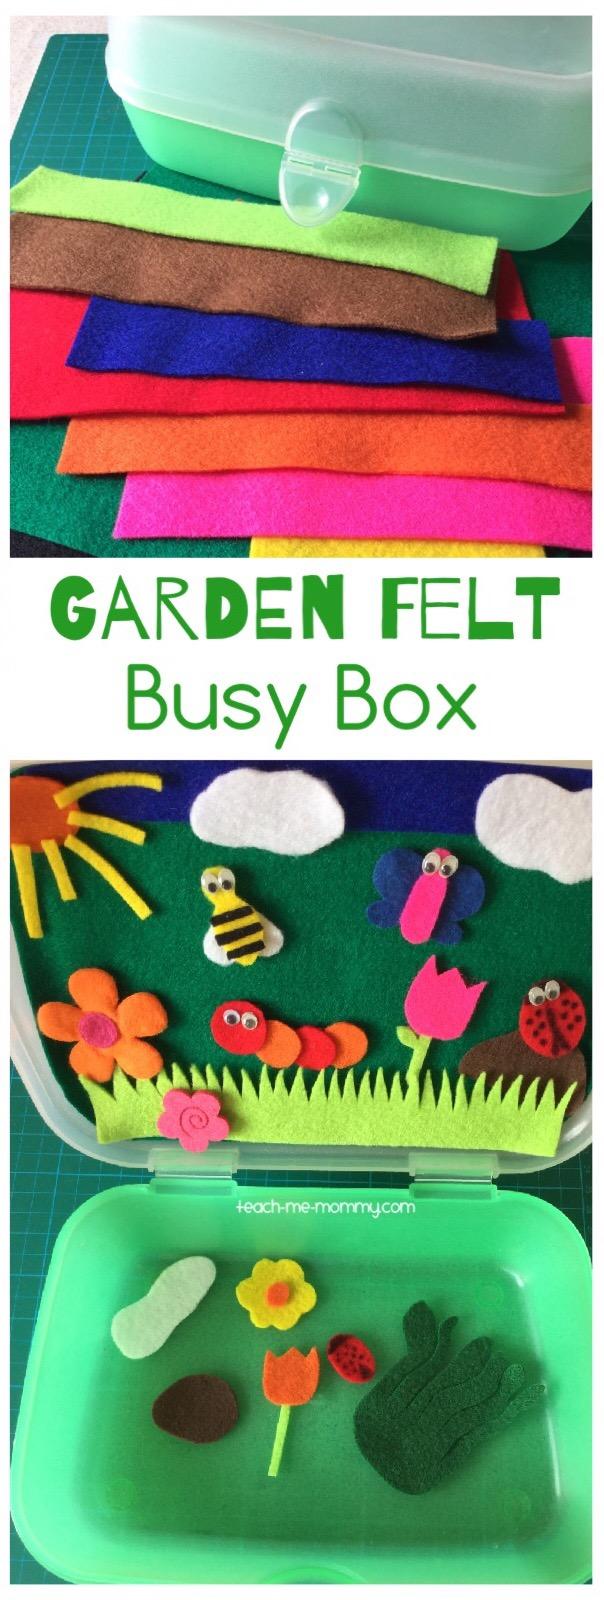 garden felt busy box